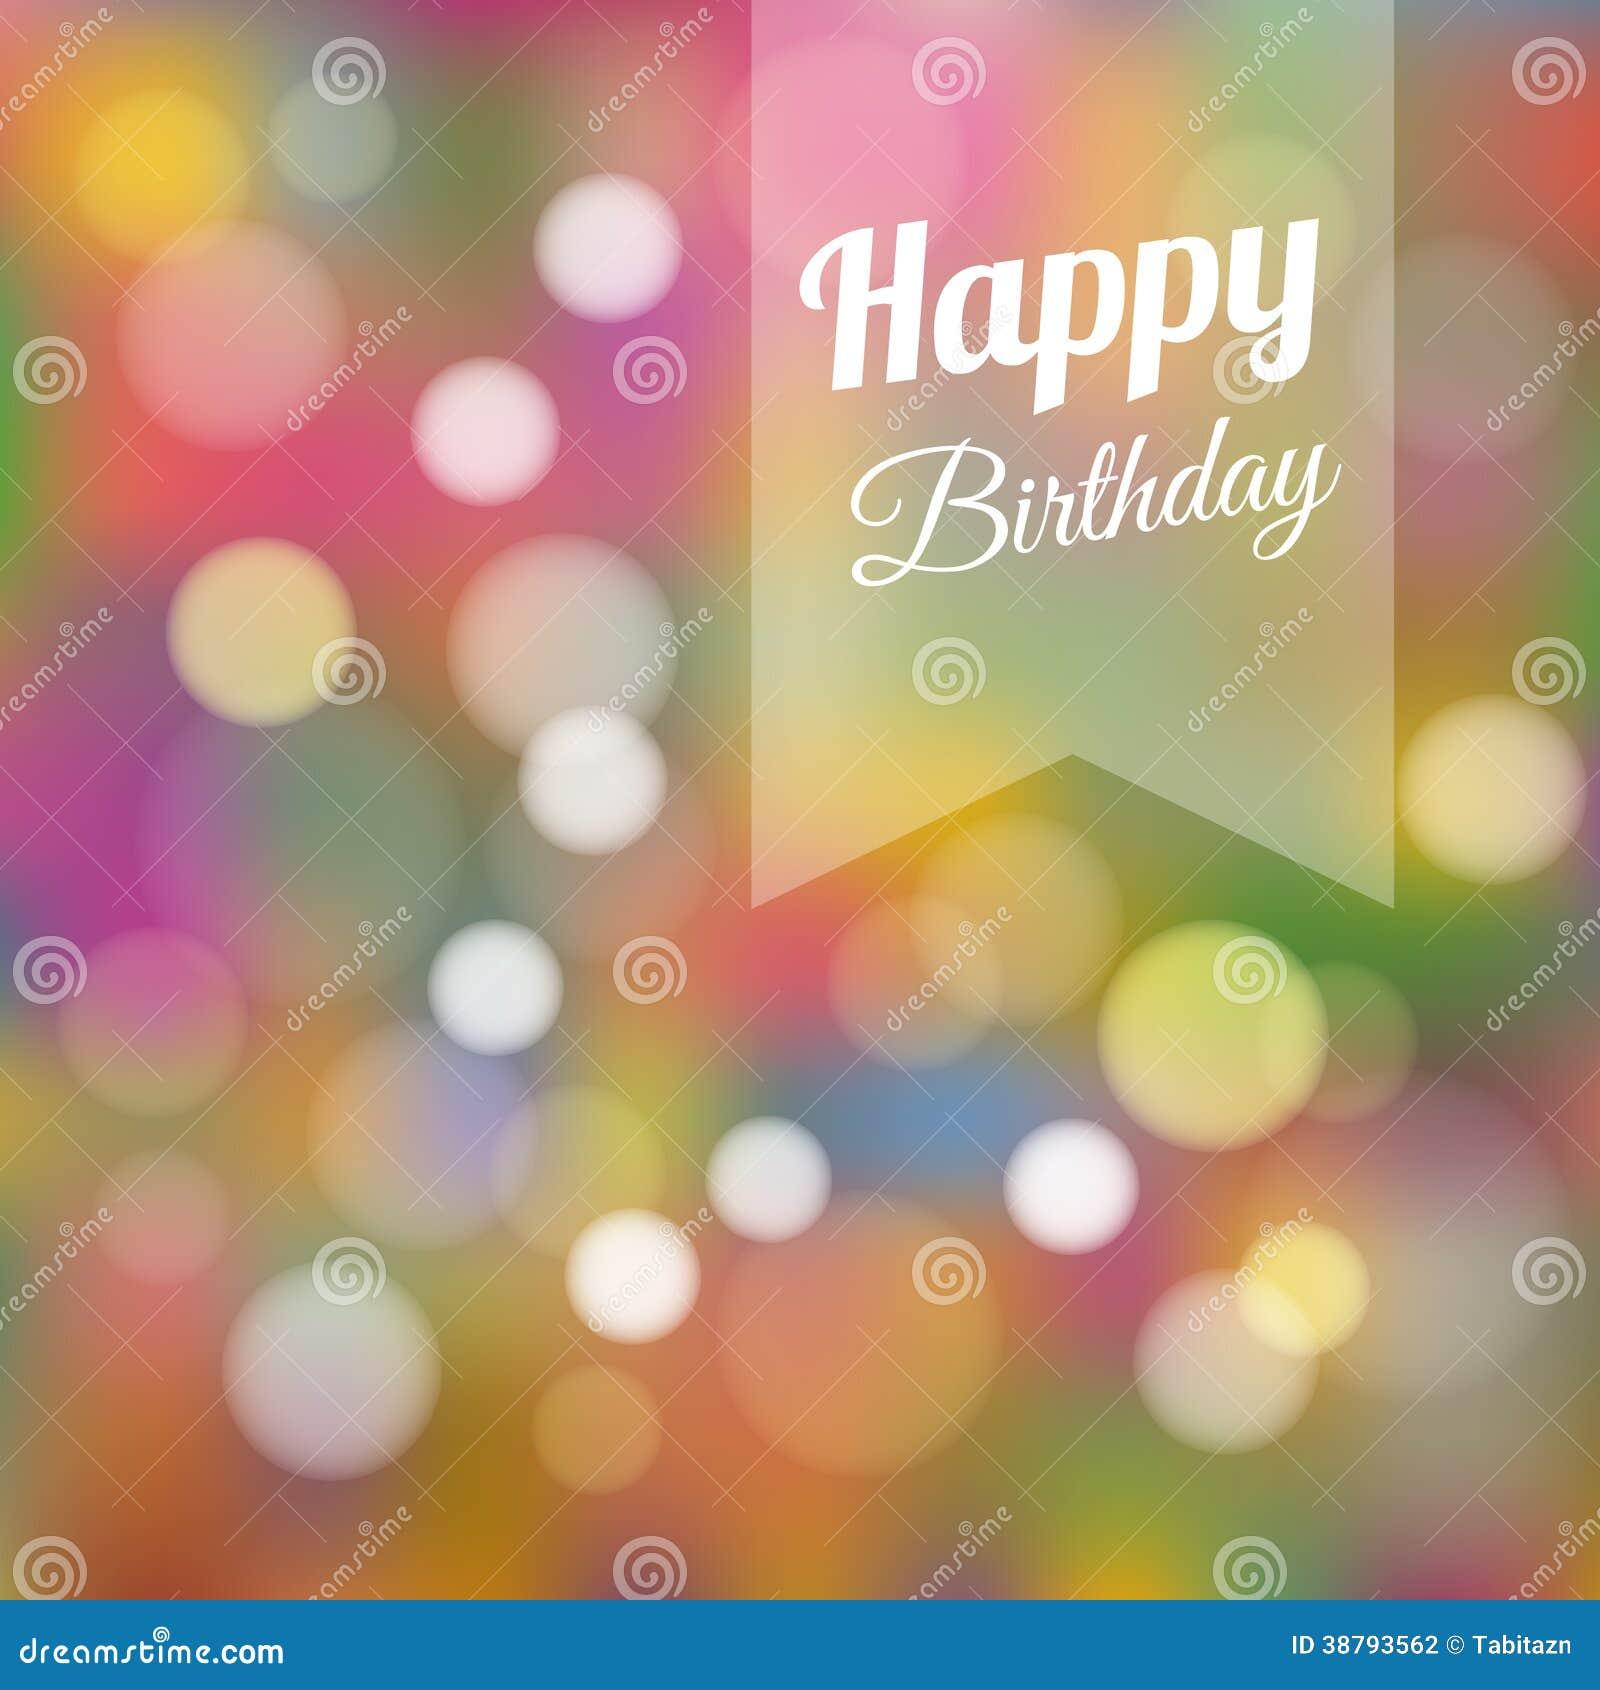 Birthday Card Invitation, Background Stock Vector - Image ...